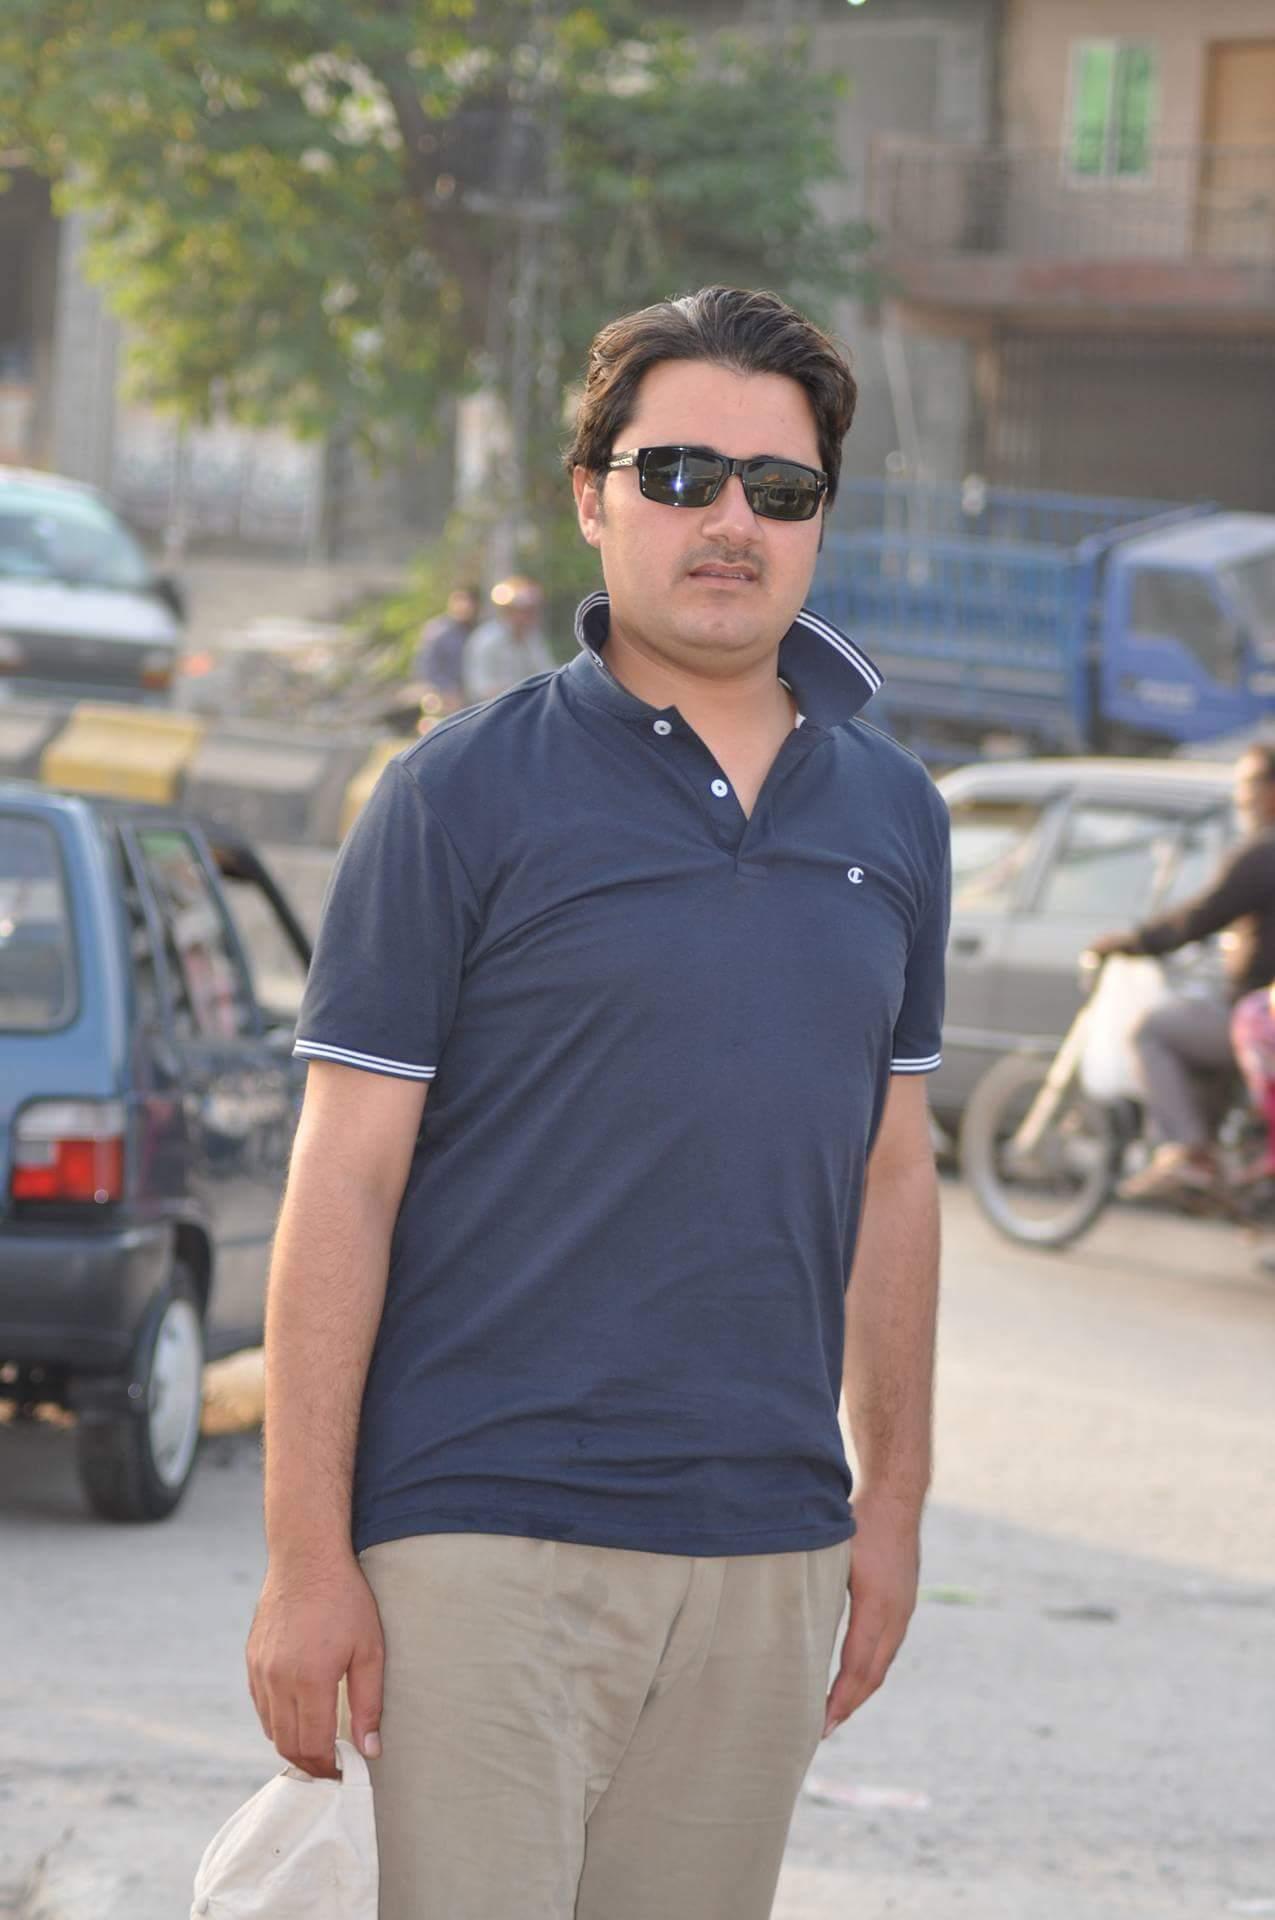 Saad Ullah